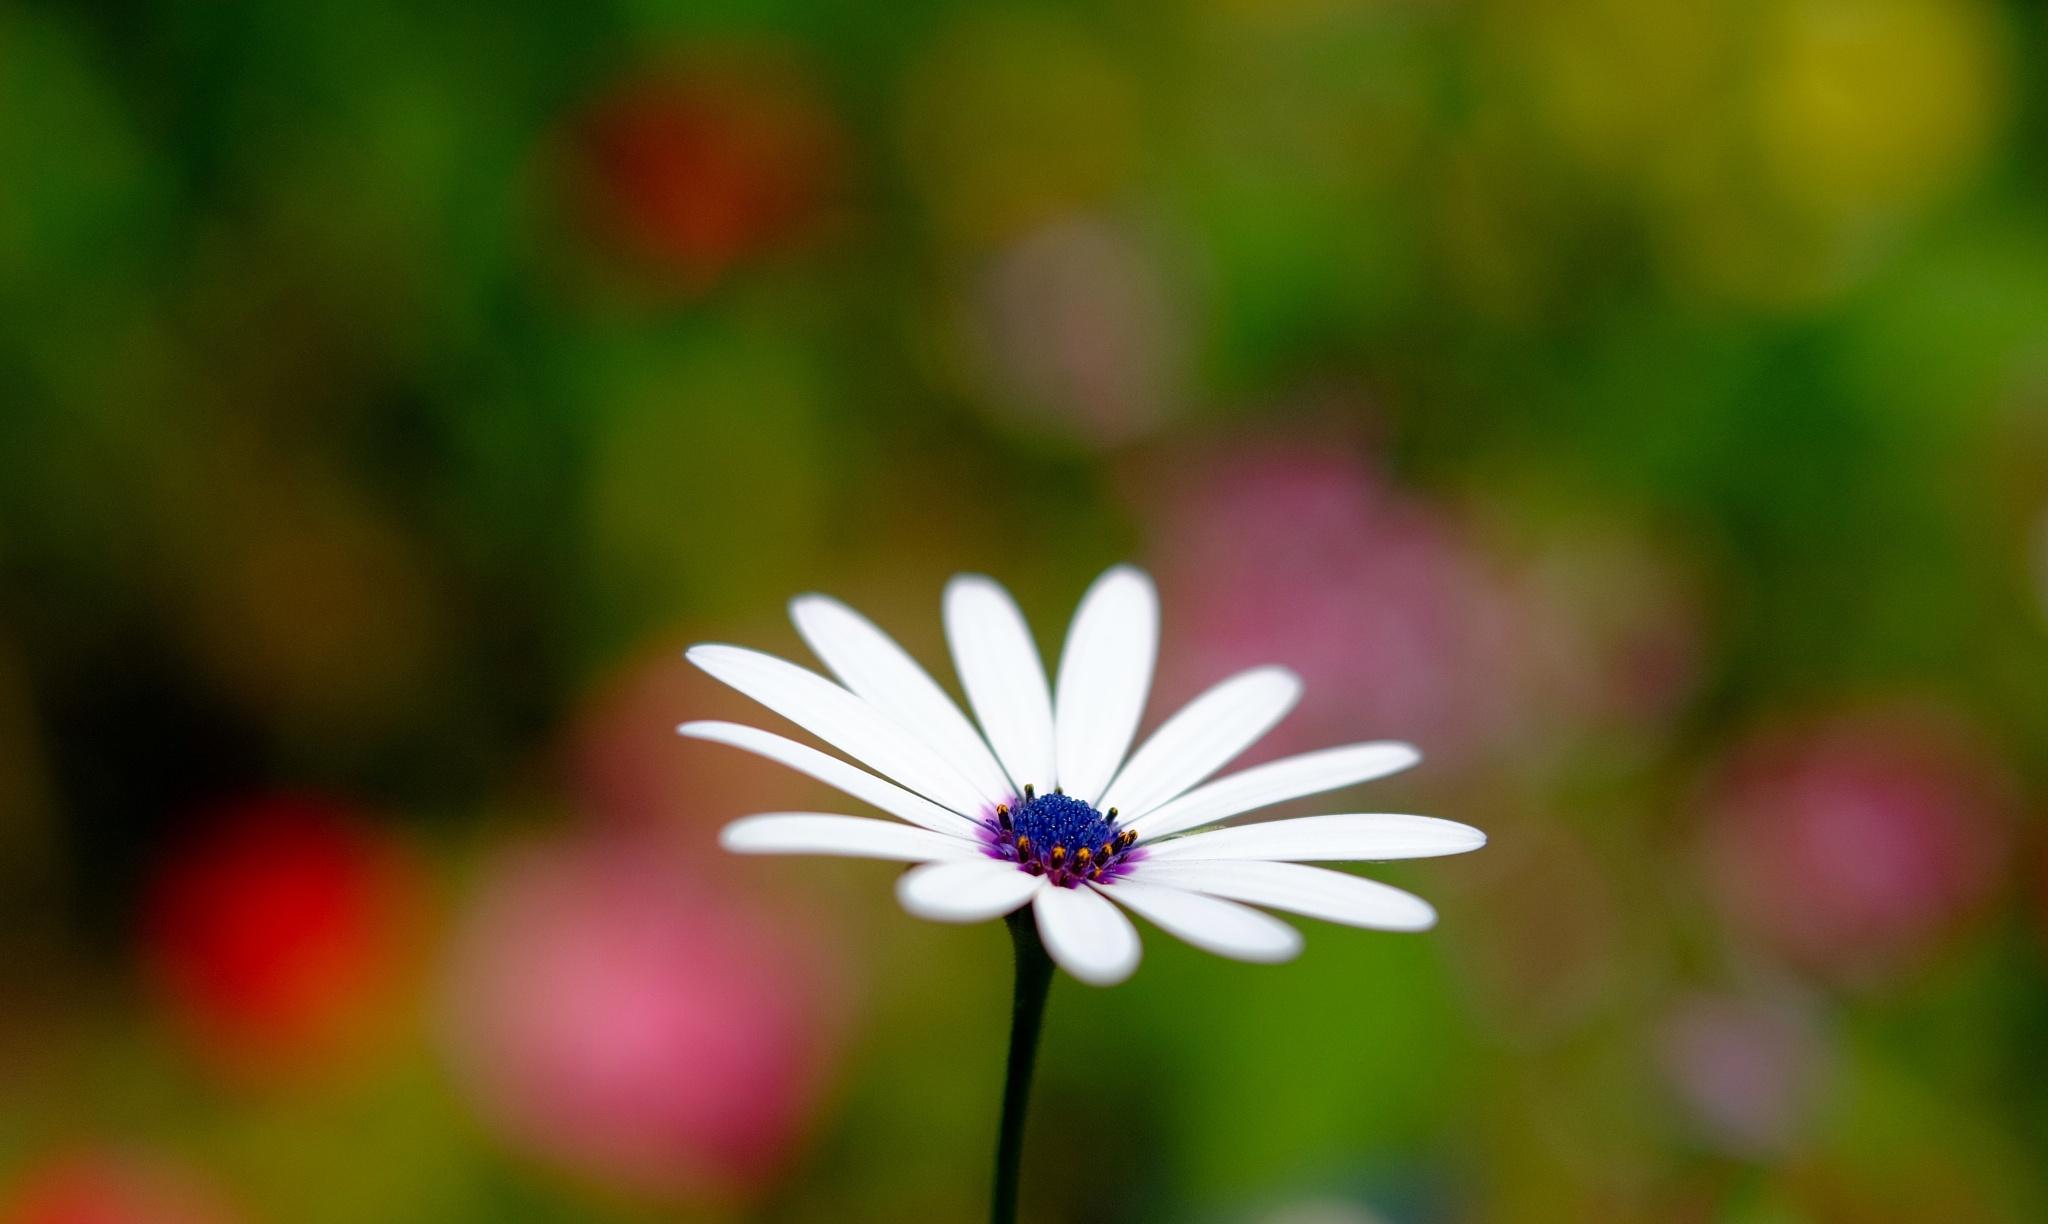 Flower by sh1ft